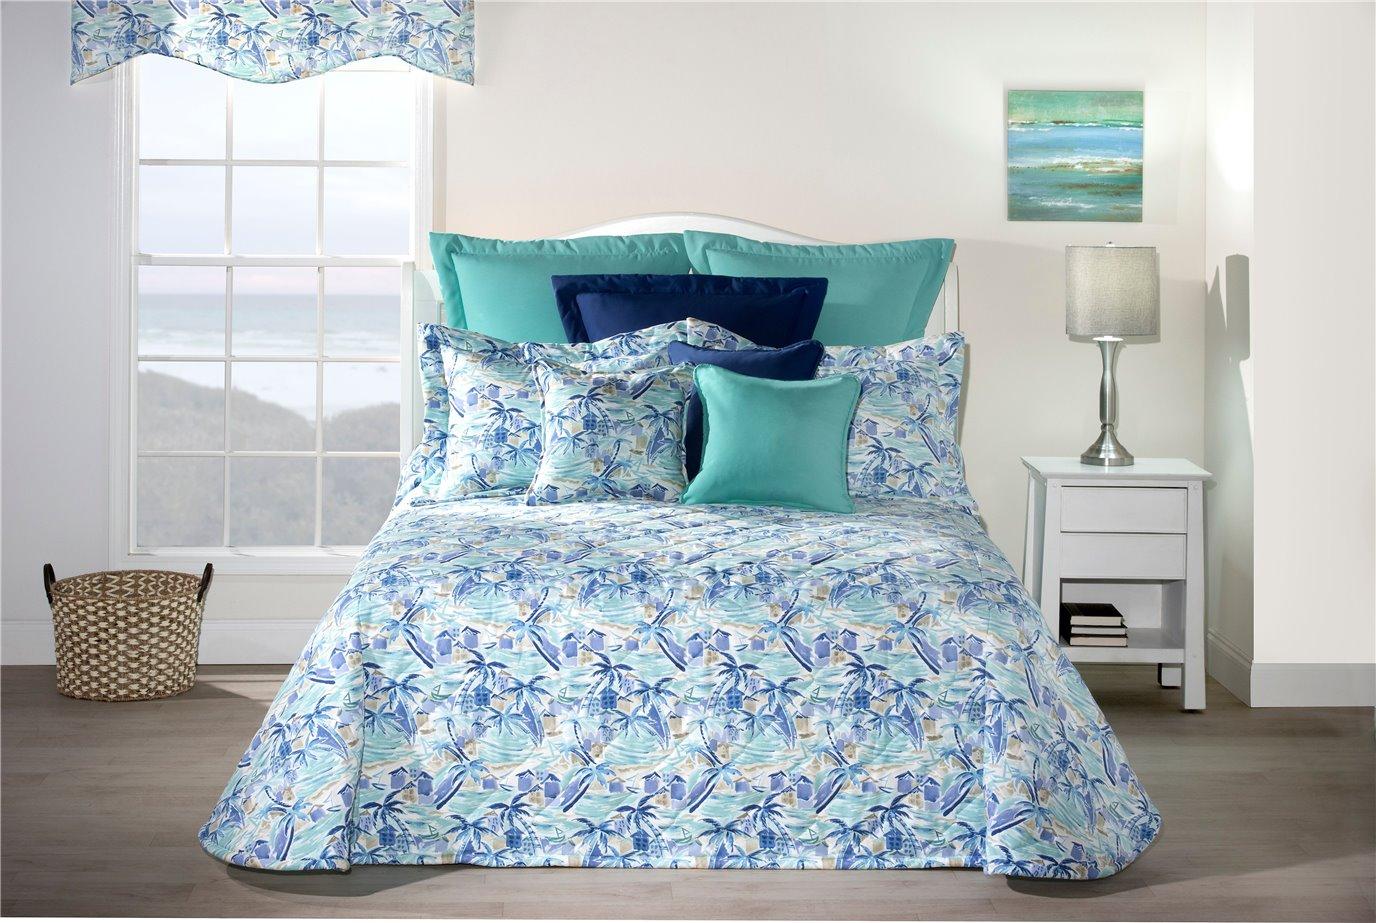 Tropical Paradise Blue Cal King Bedspread